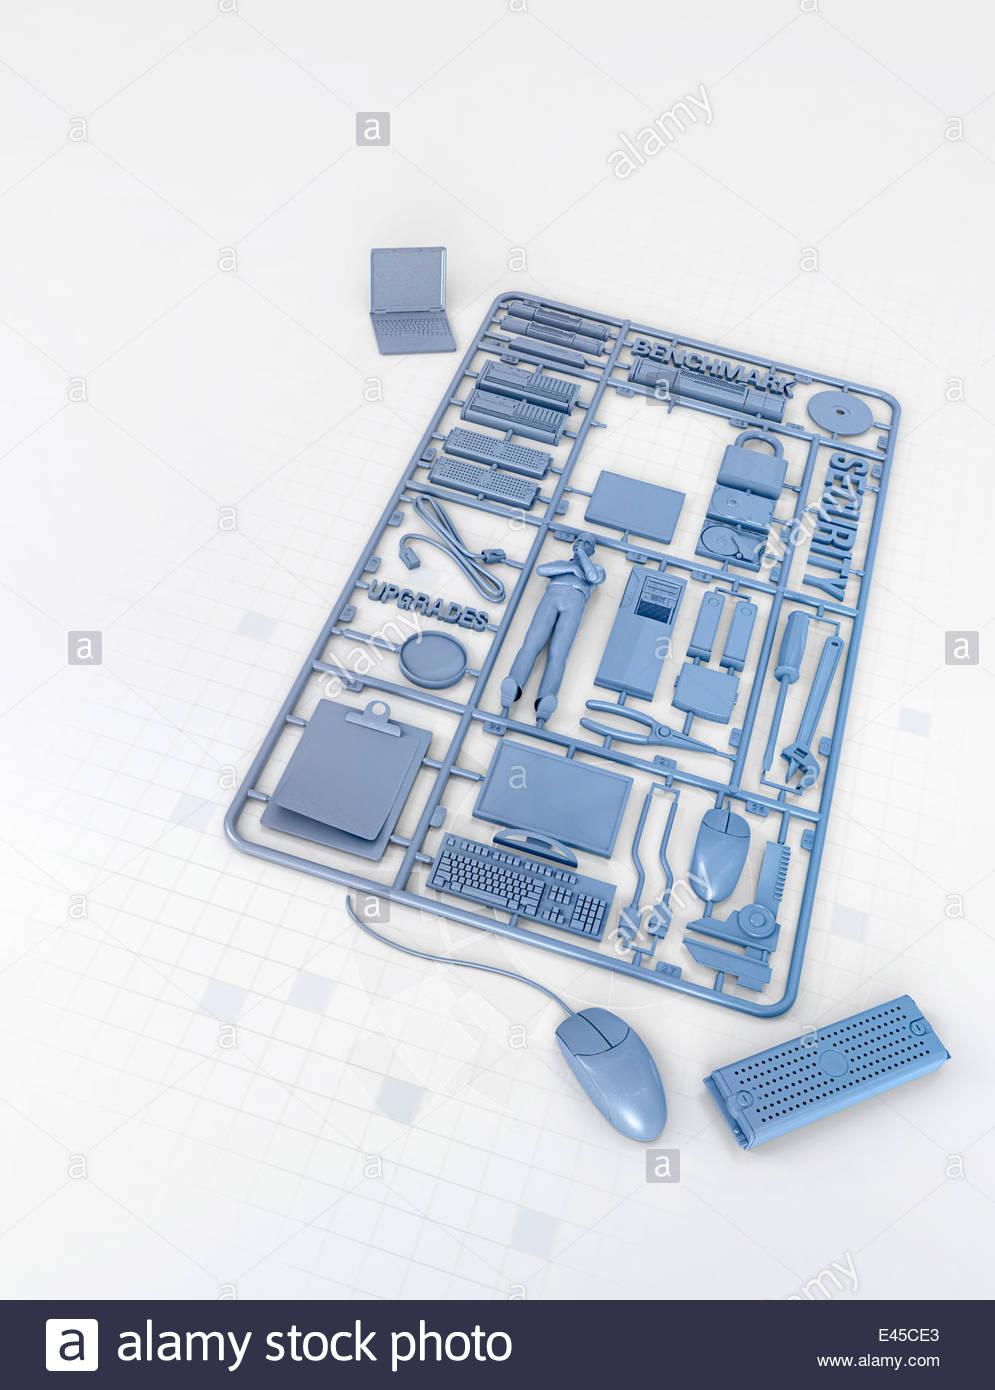 Plastic computer assembly kit - Stock Image